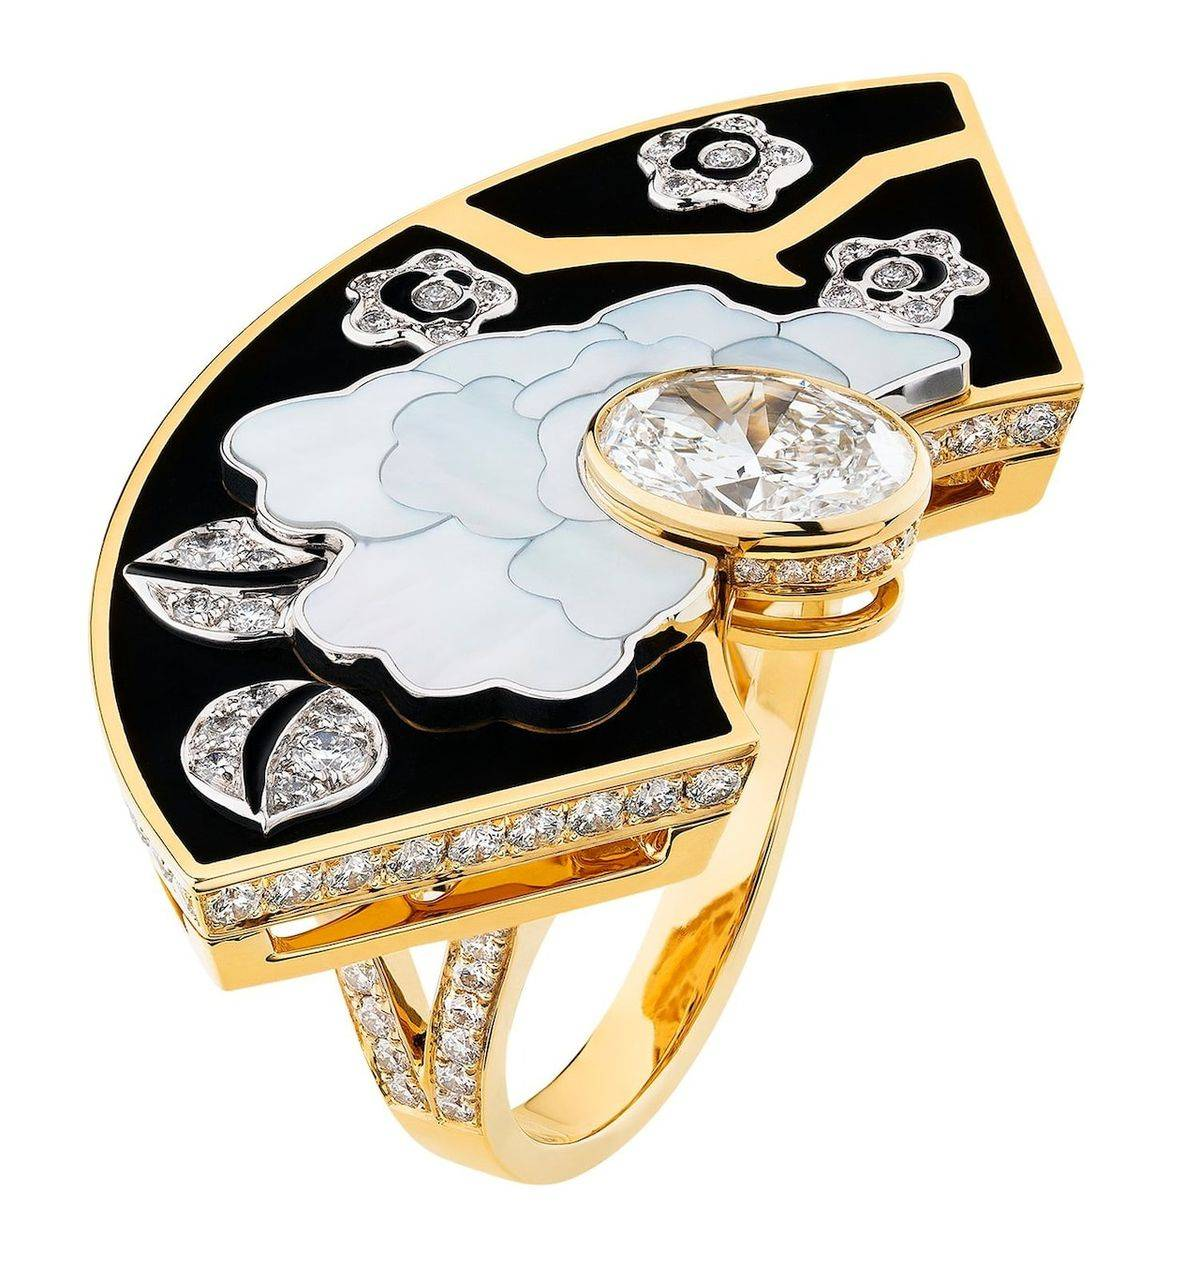 Art deco jewelry-52284045659790695